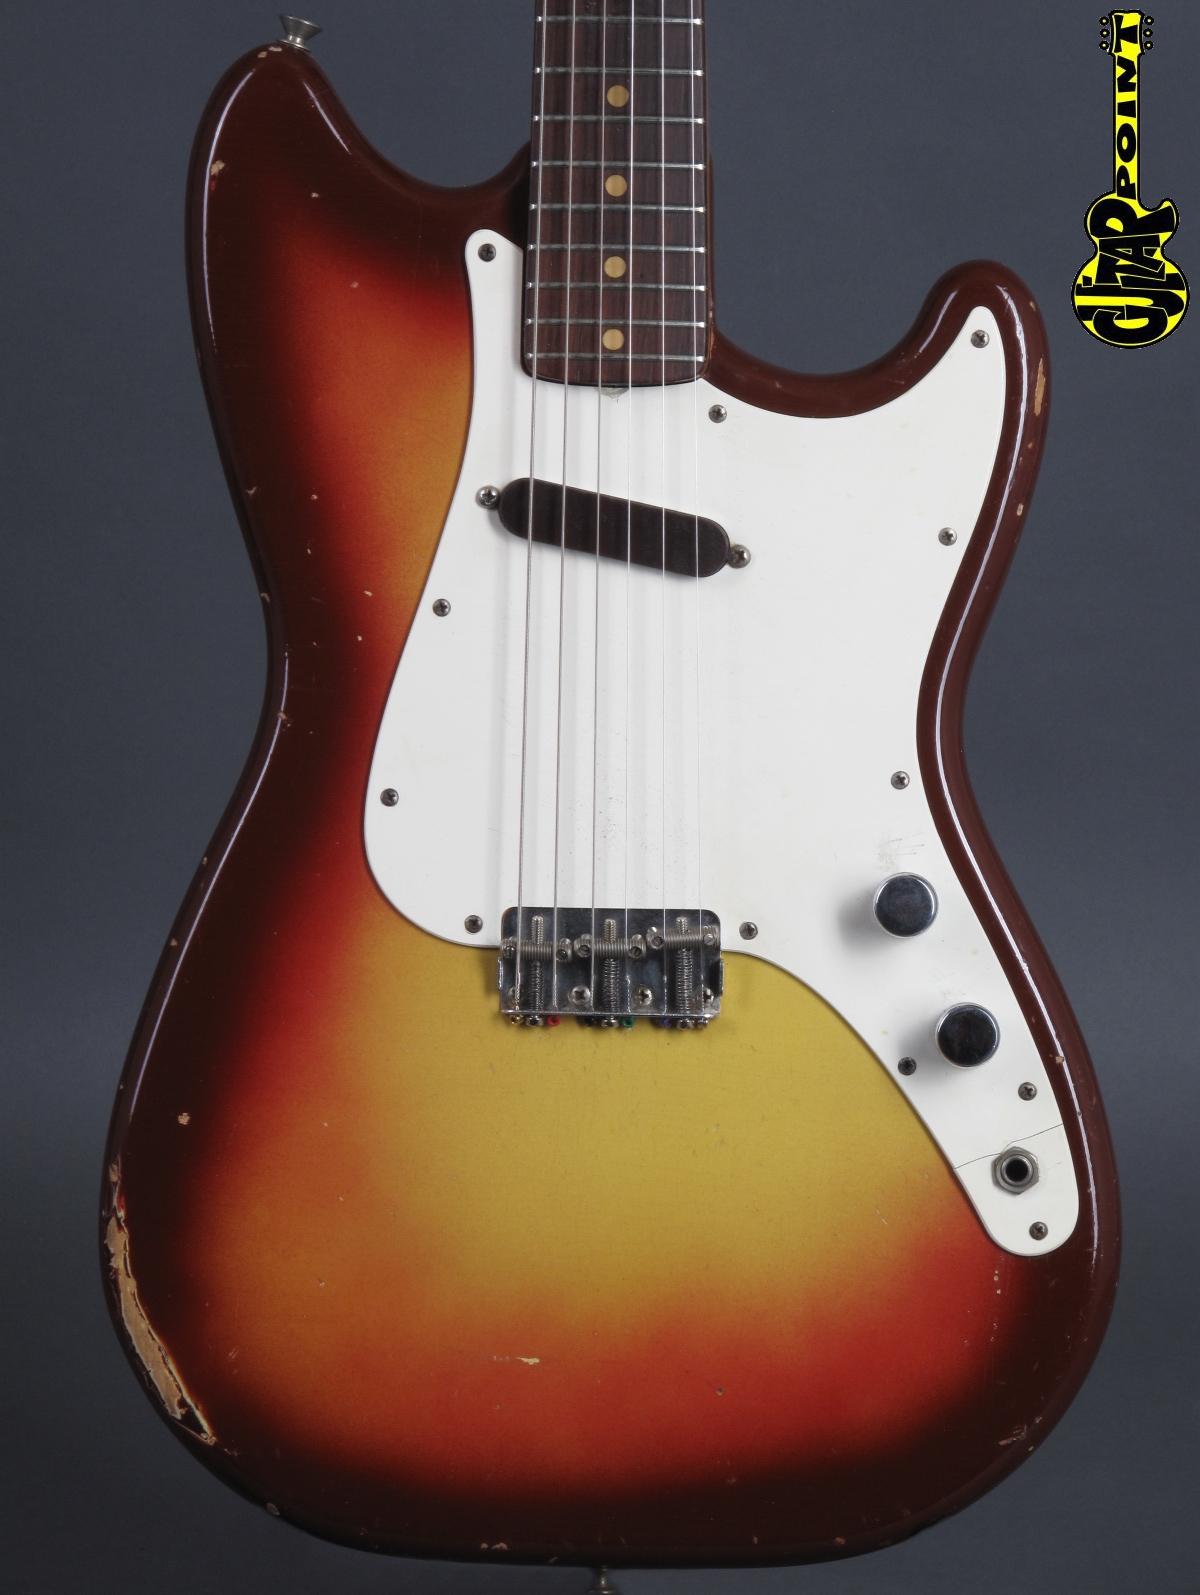 1963 Fender Musicmaster – Sunburst